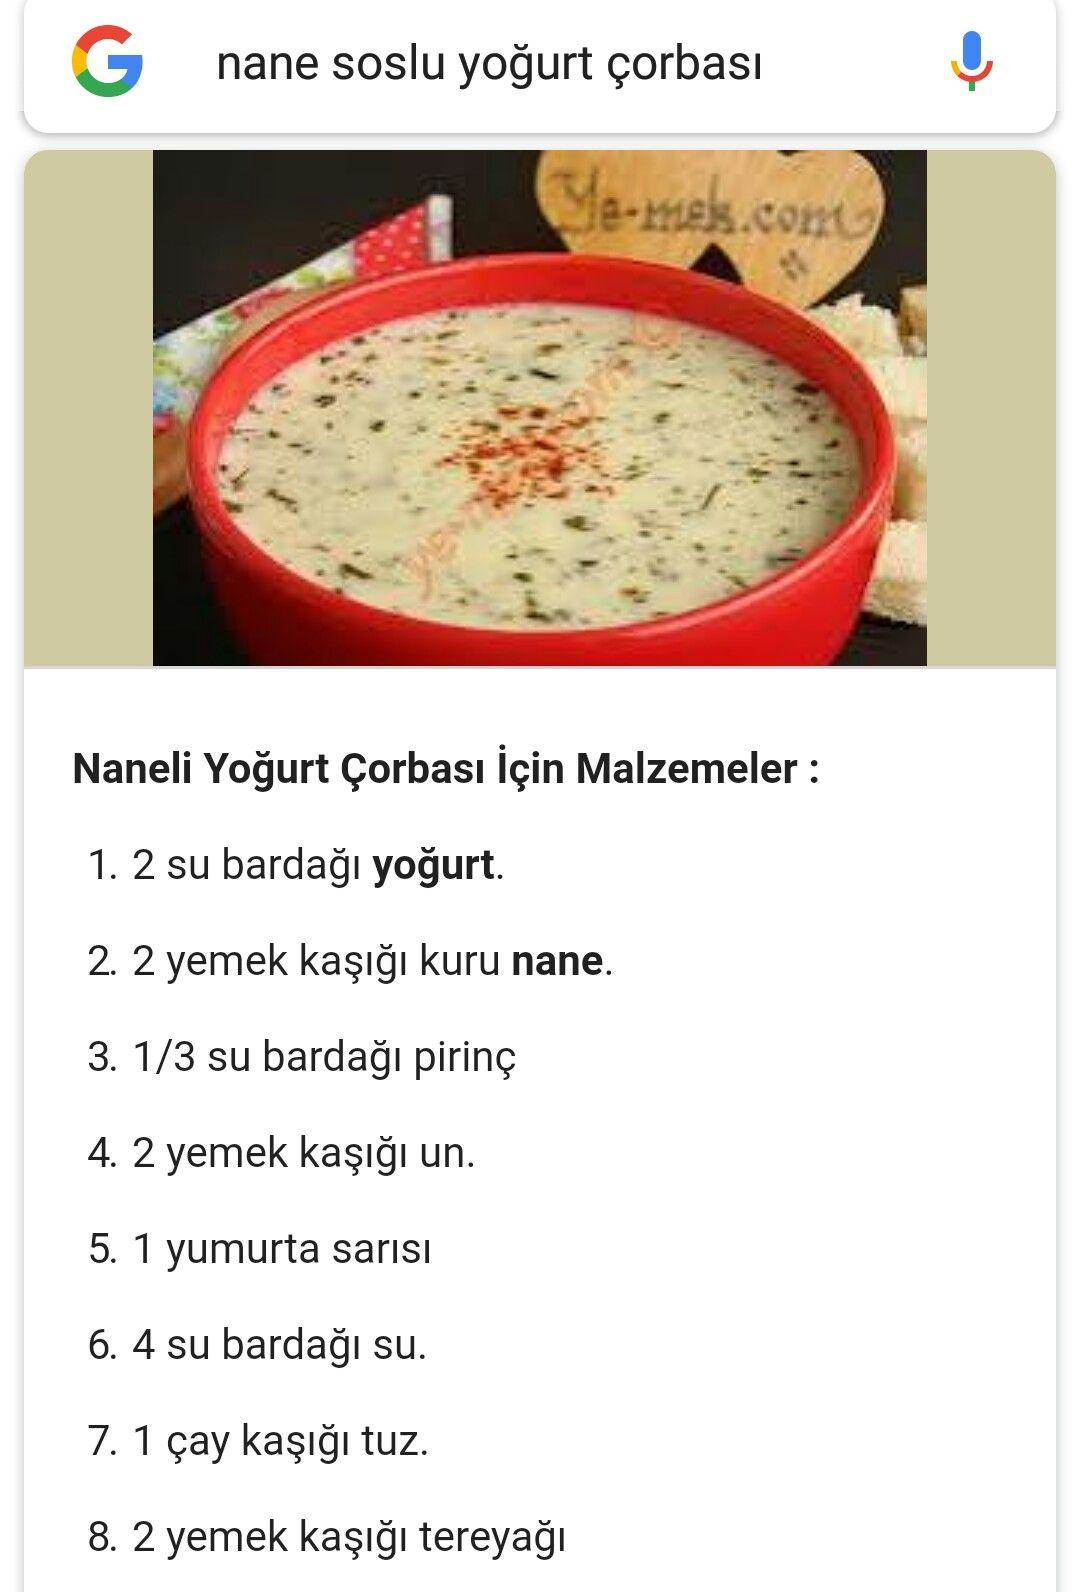 Nane Soslu Yogurt Corbasi Yemek Nane Pasta Tarifleri